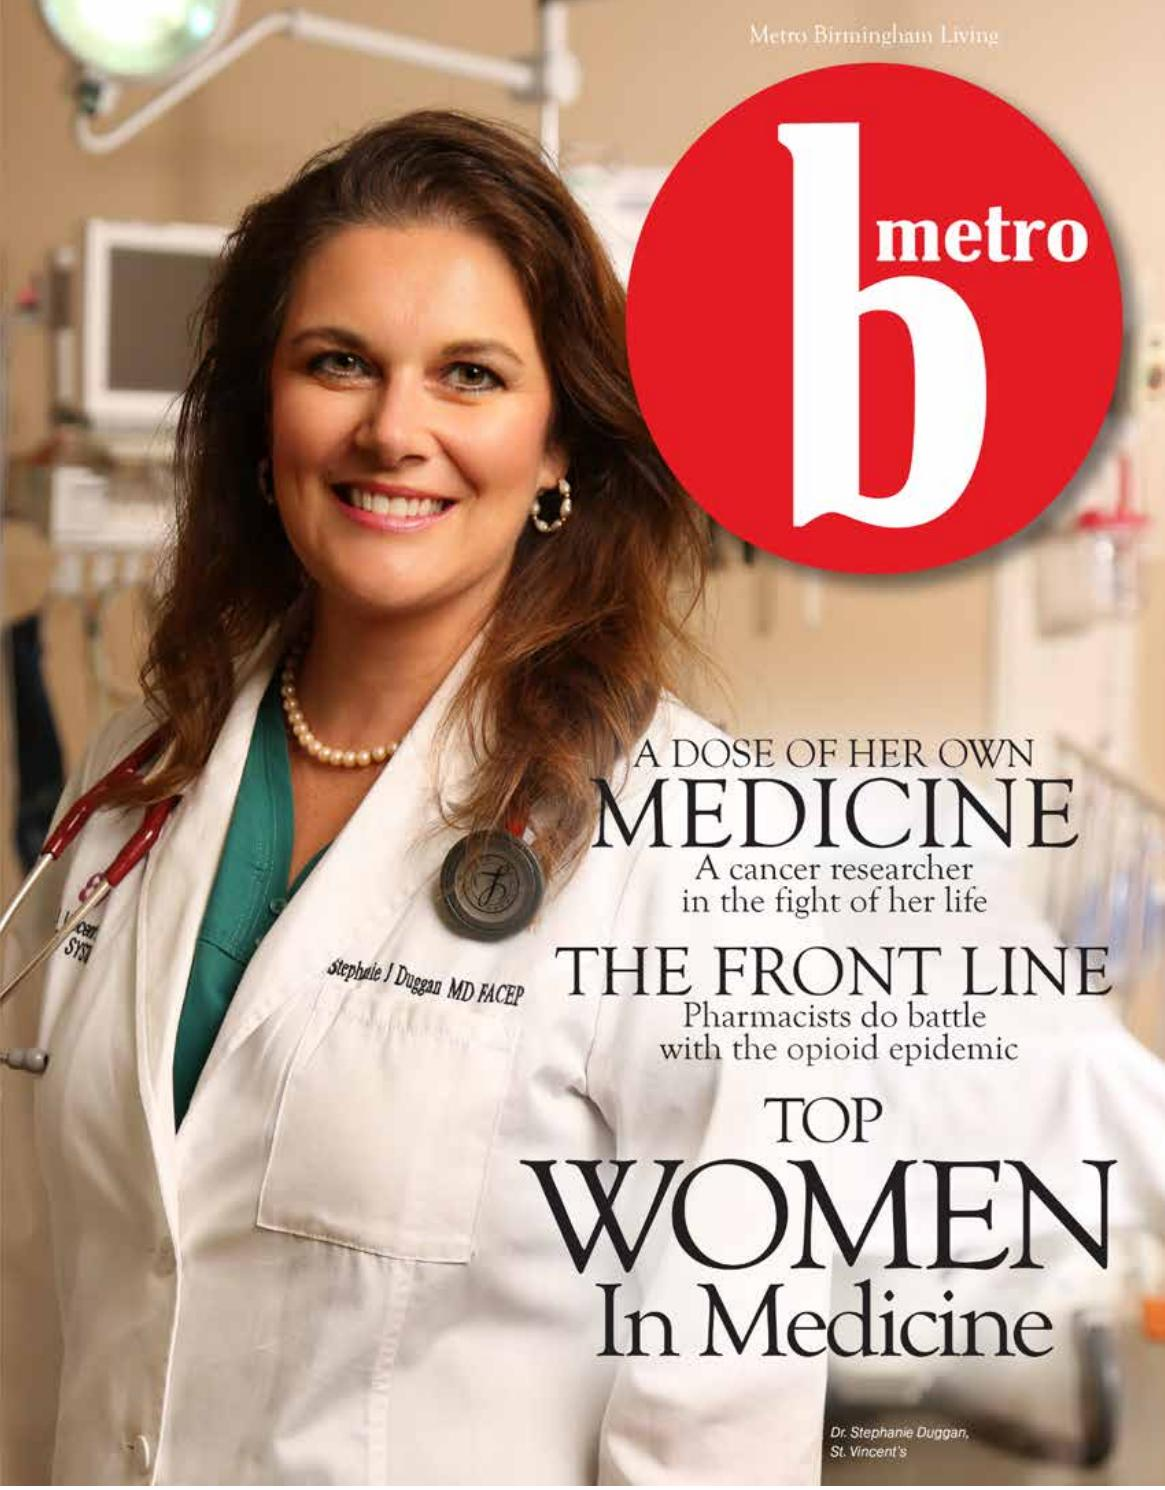 b metro s top women in medicine by fergus media   issuu